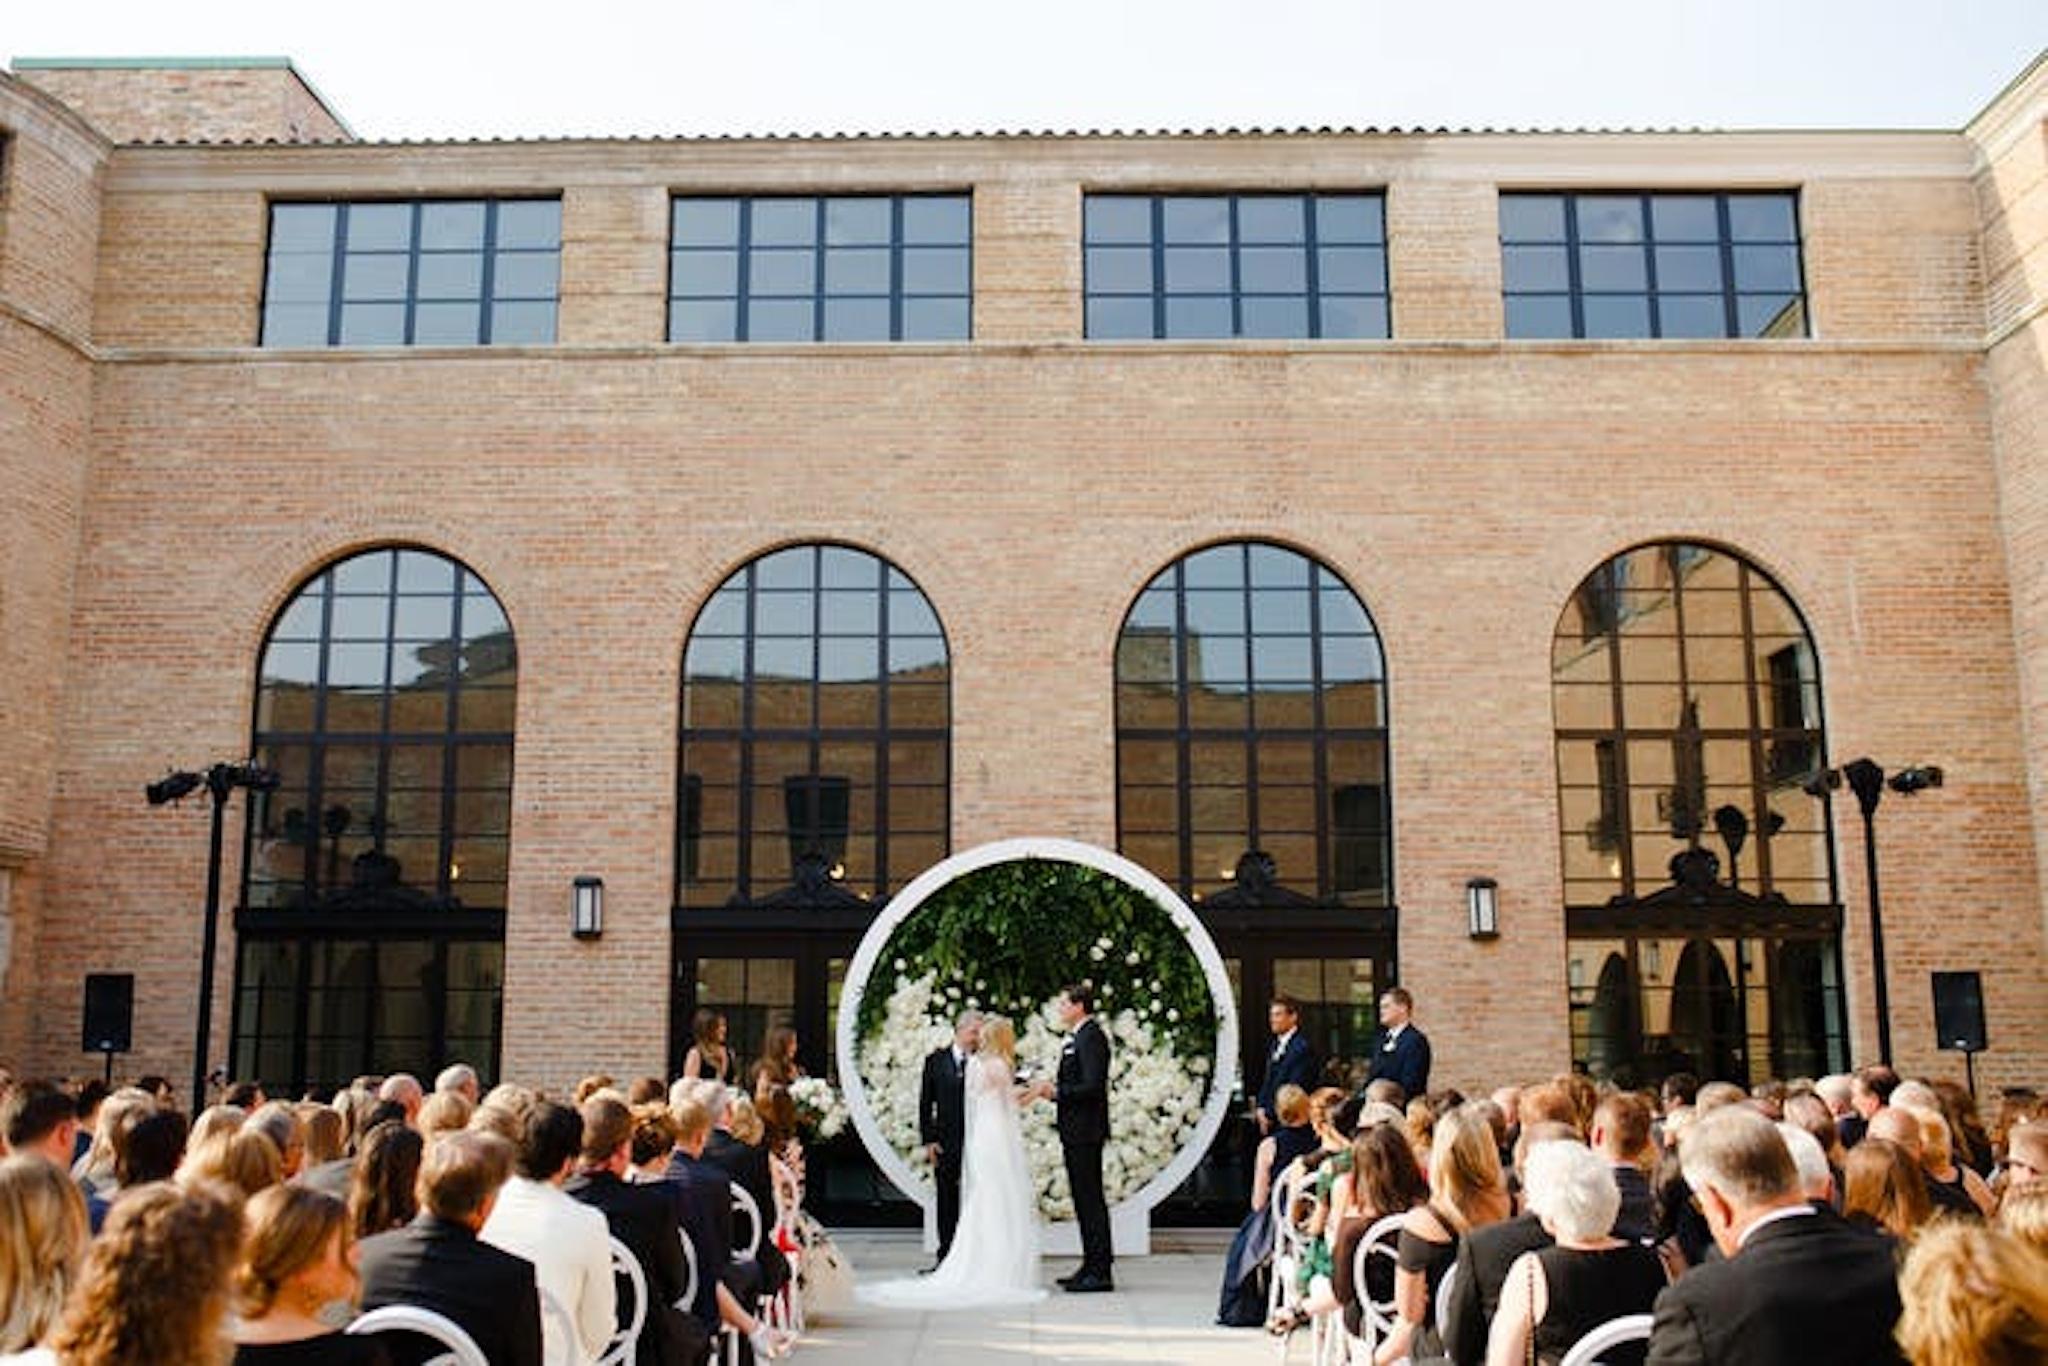 Wedding circular arch